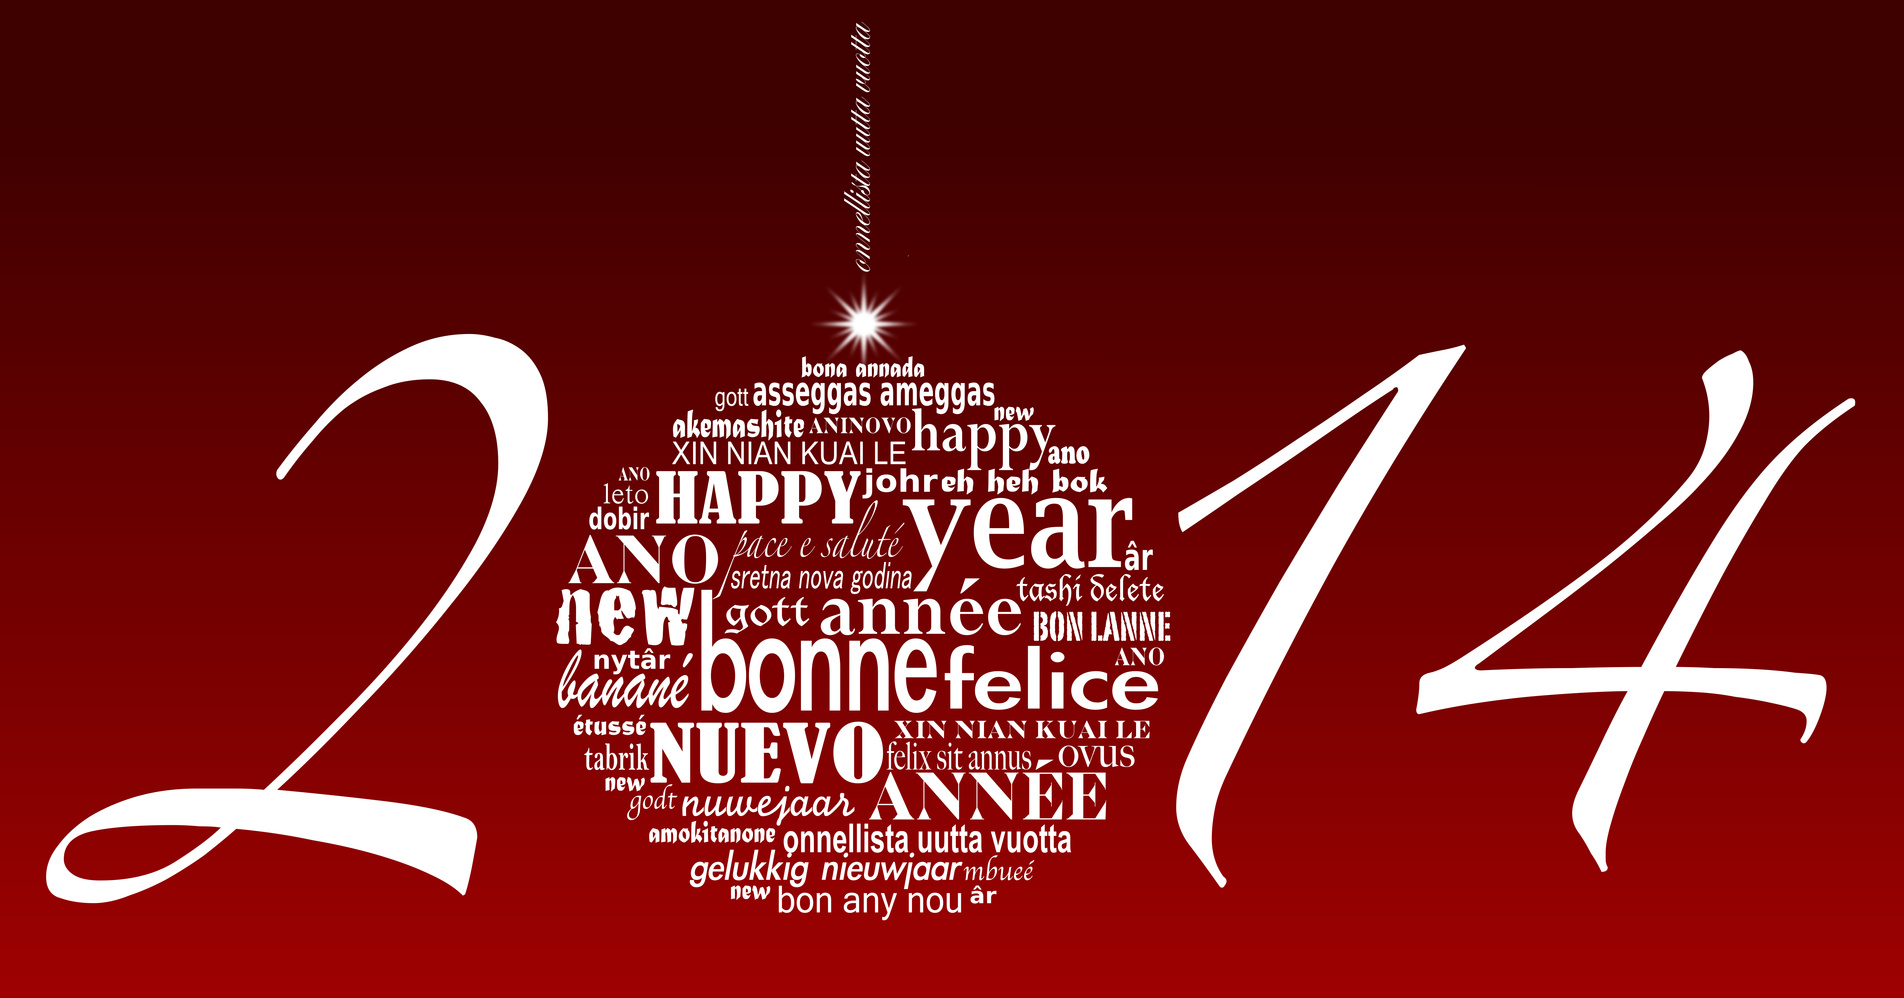 Joyeux Noël et heureuse année 2014